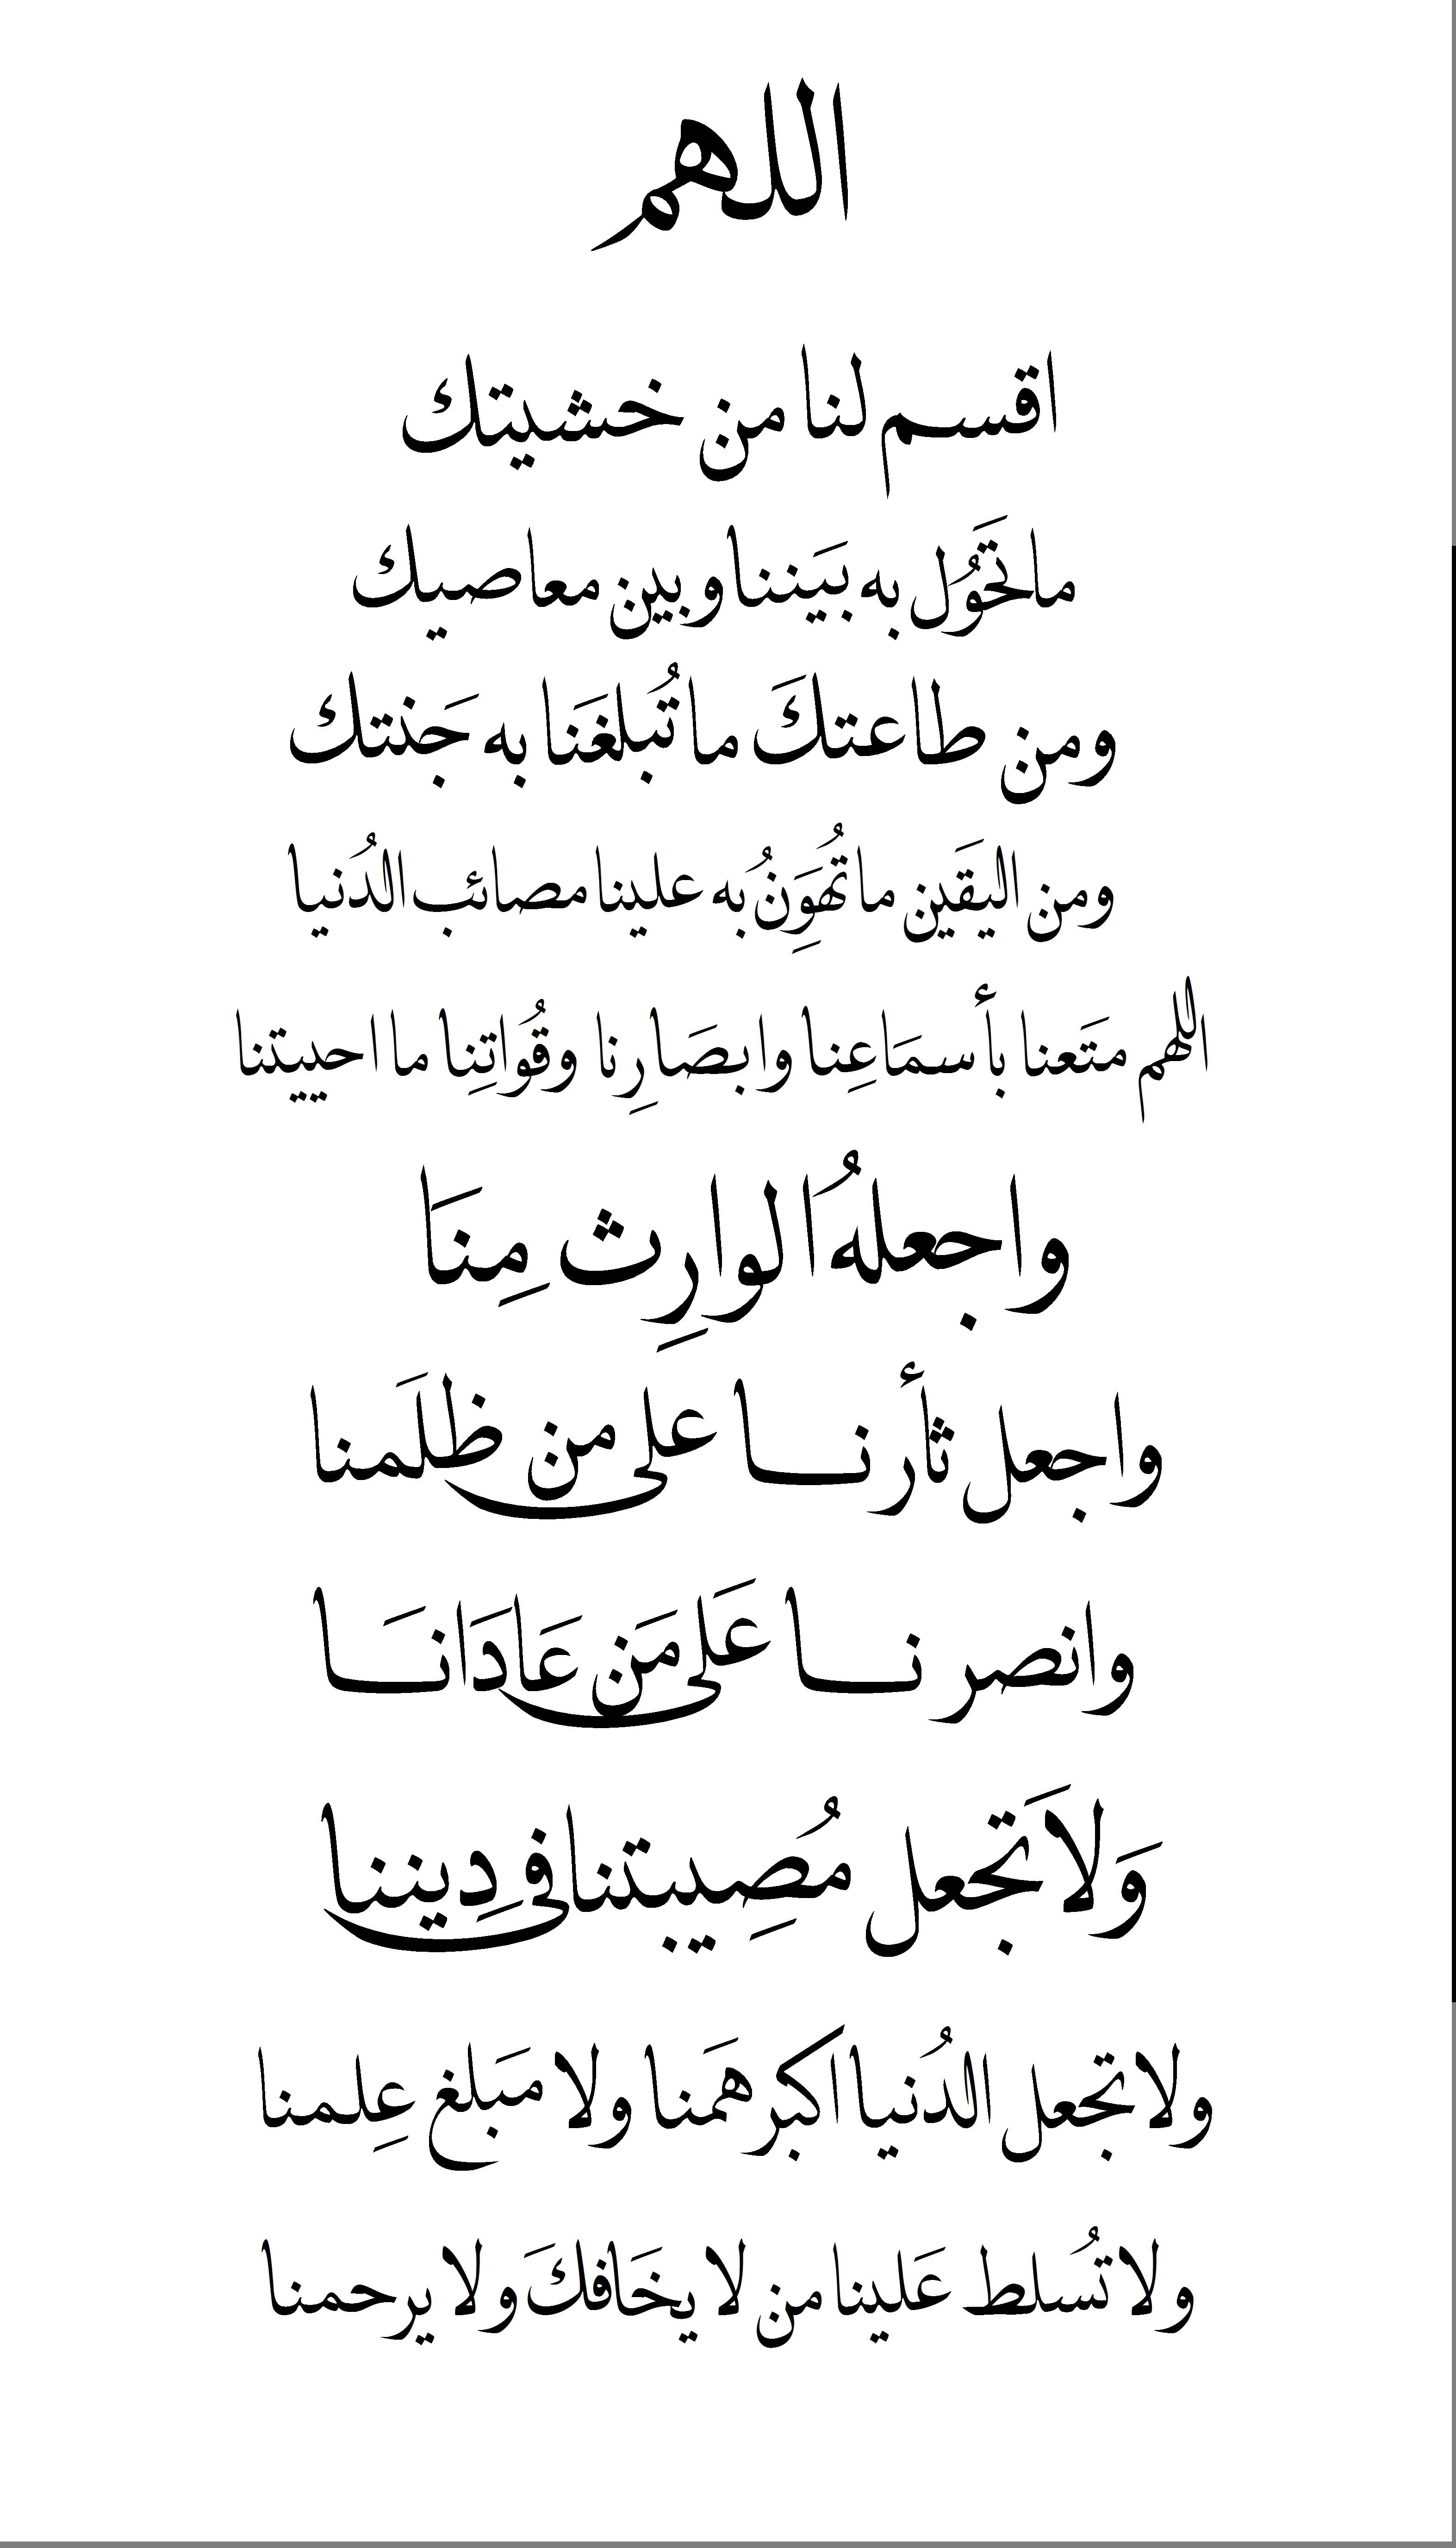 Great Duaa دعاء عظيم Islamic Love Quotes Islamic Quotes Islamic Phrases